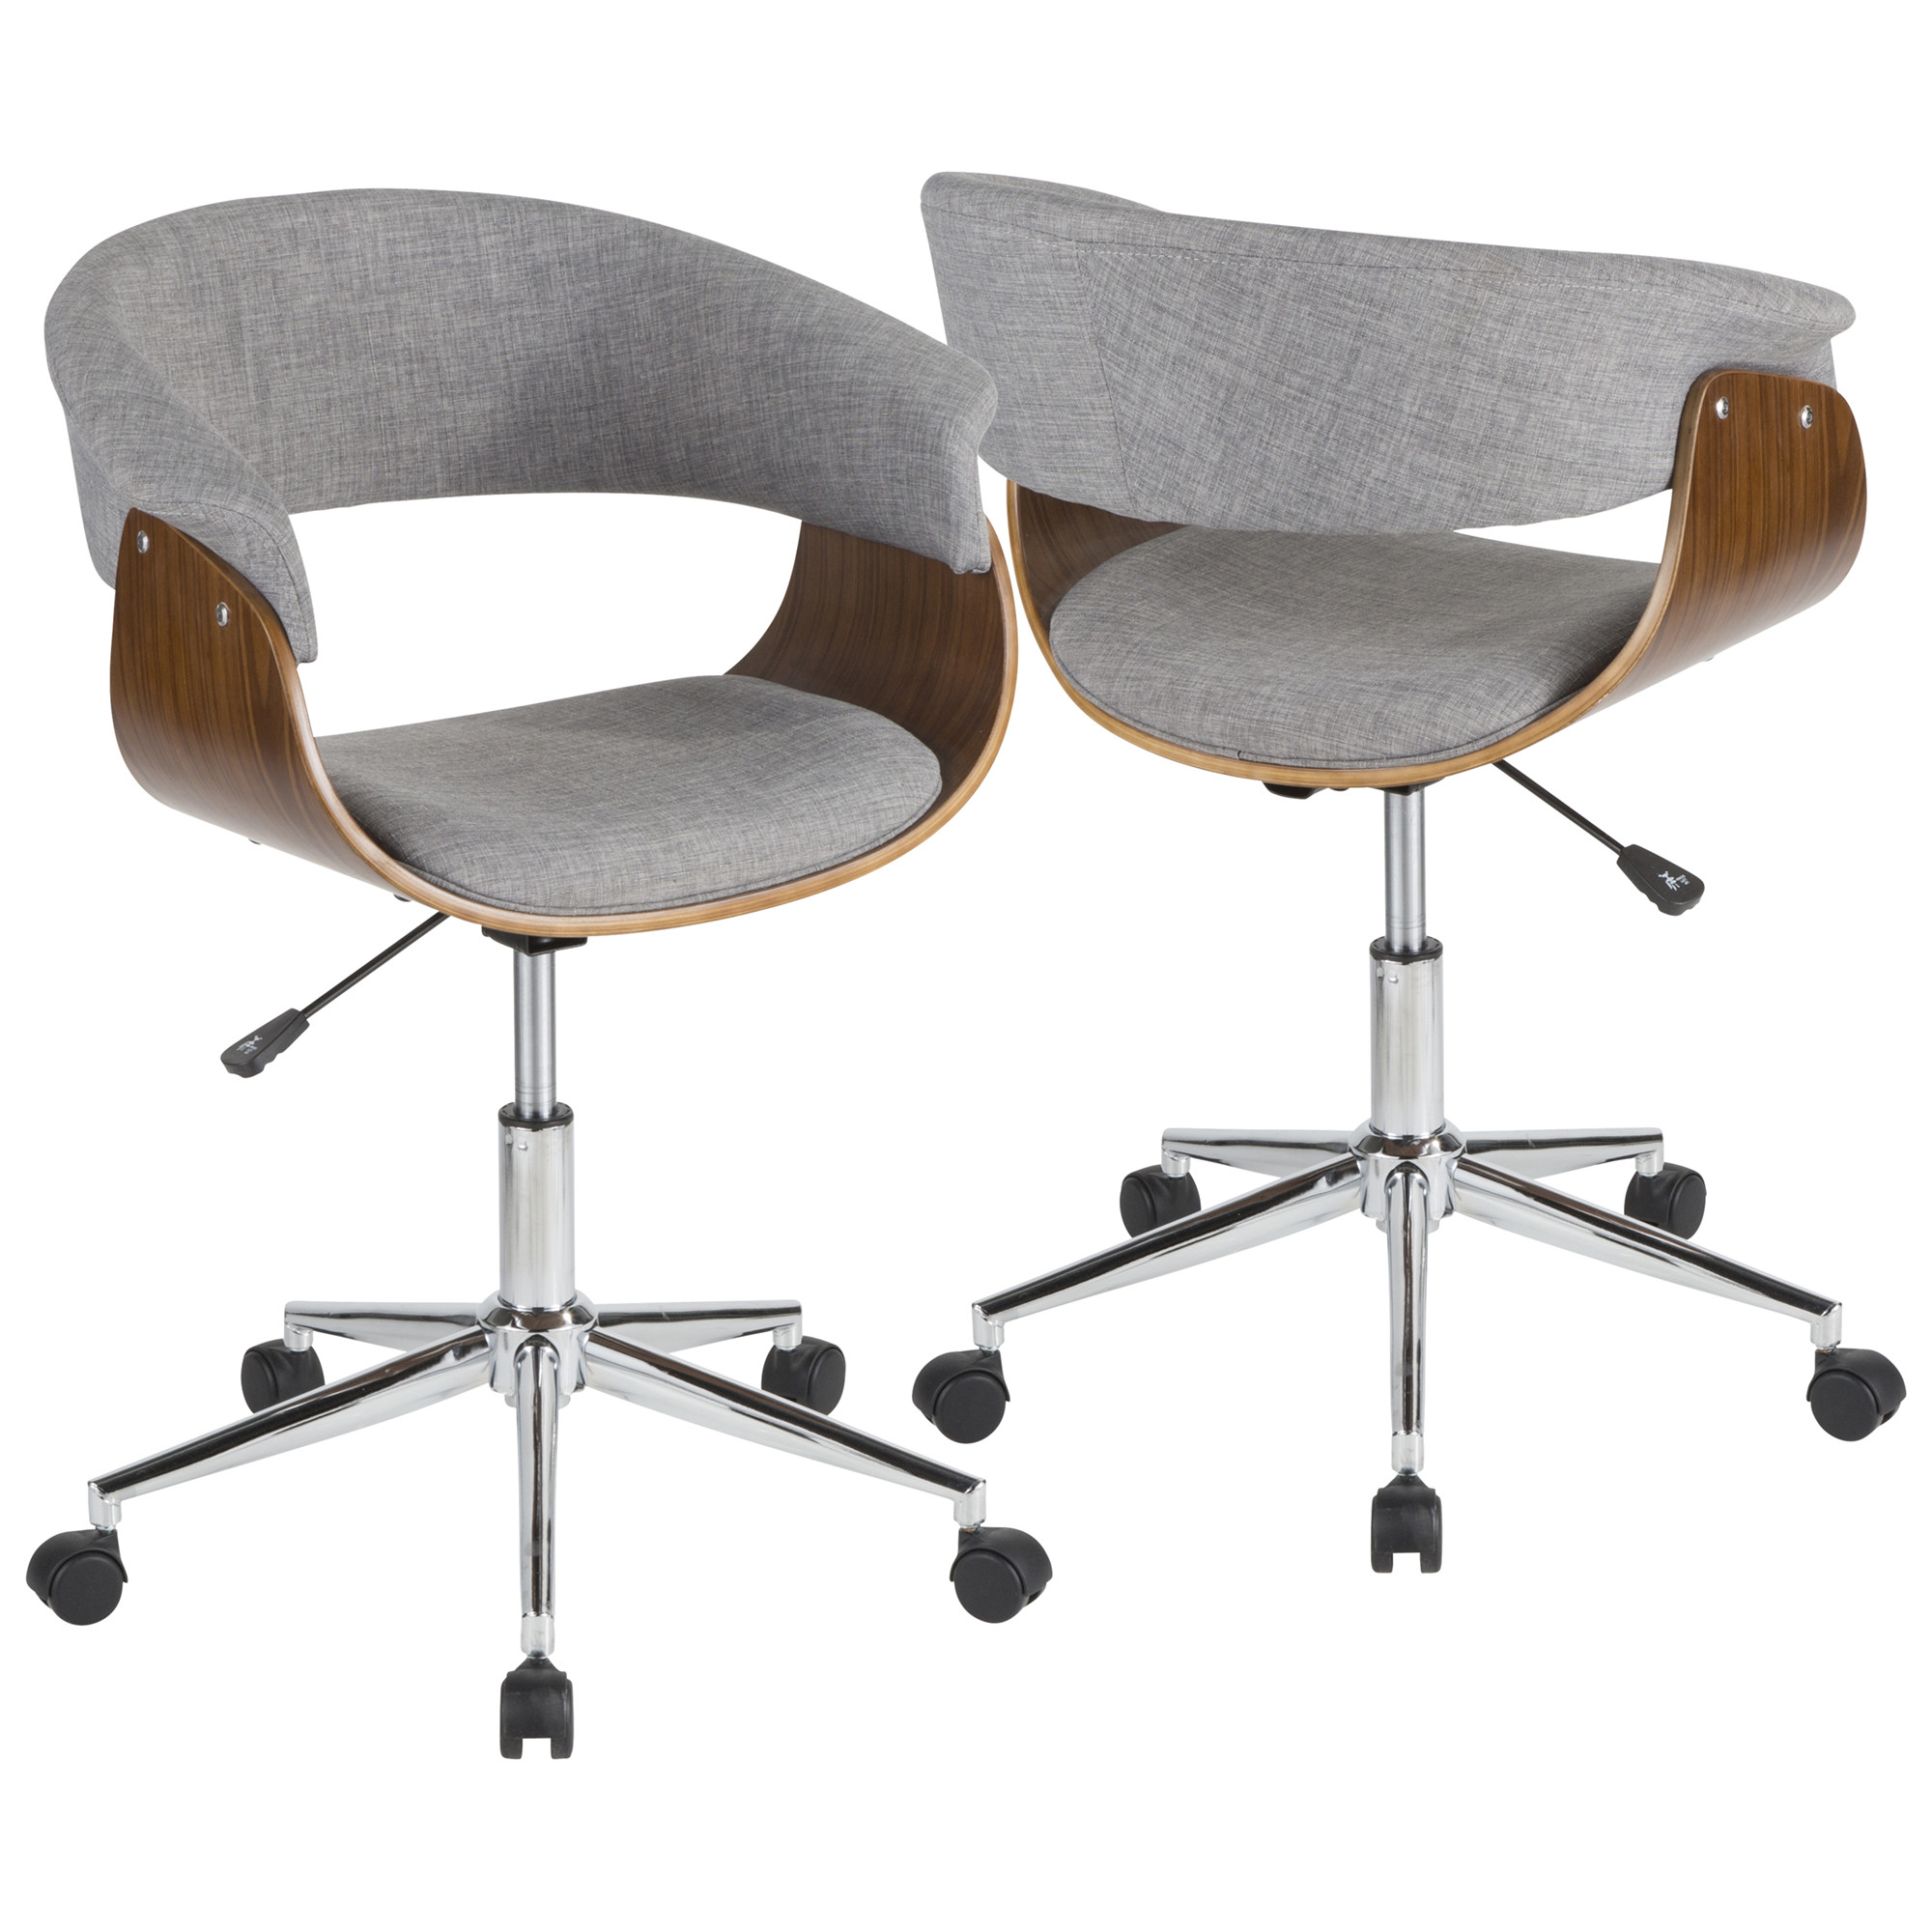 Vintage Mod Mid Century Modern Office Chair in Walnut Wood Light